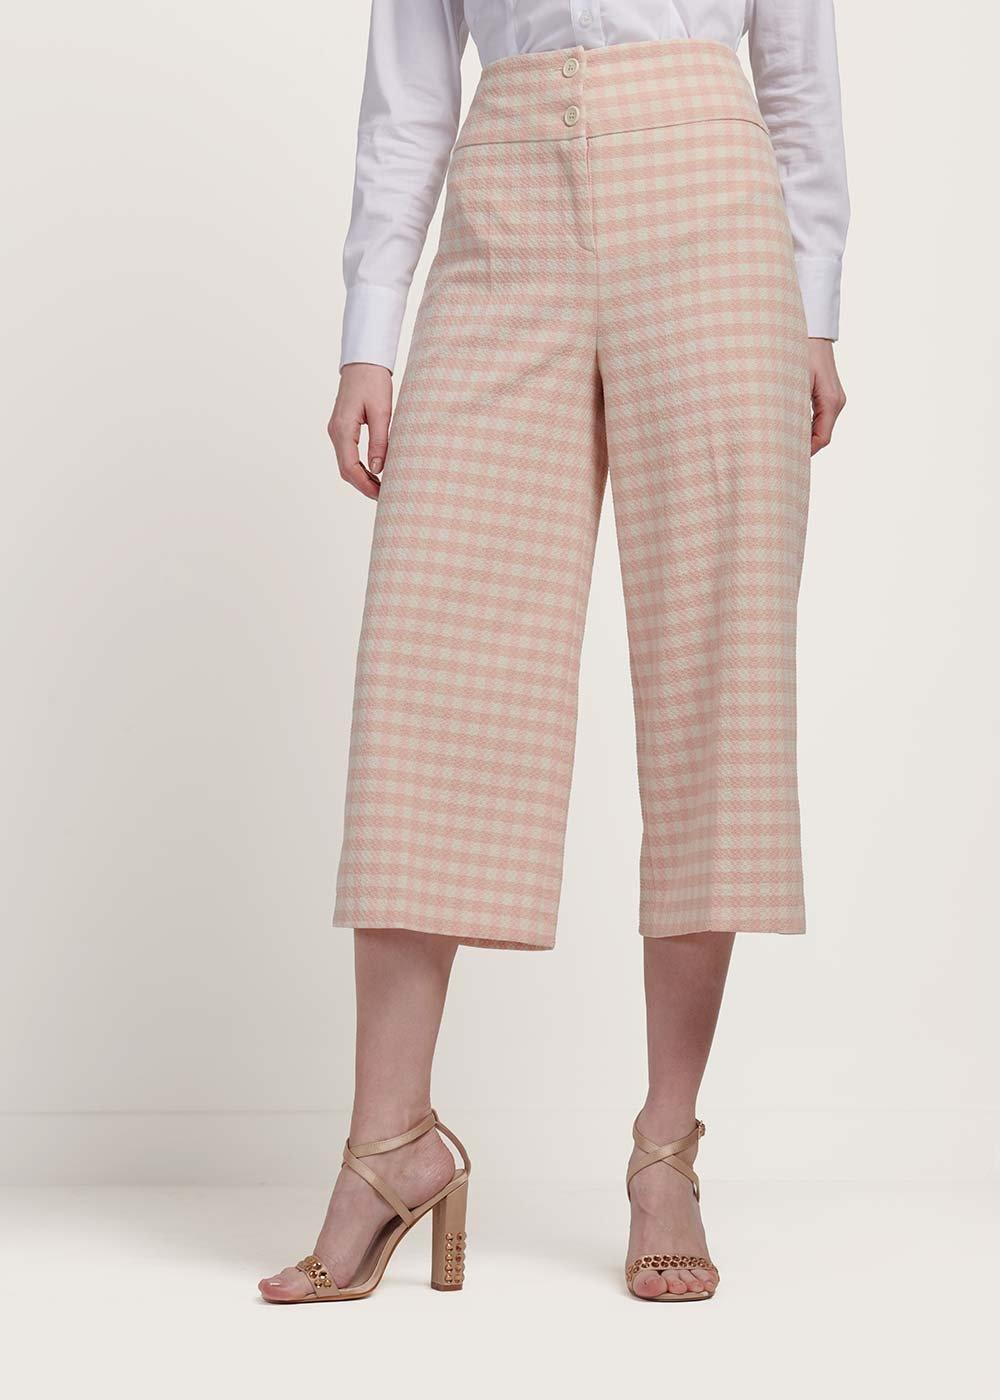 Pantalone modello Megan stampa check - White /  Rose Fantasia - Donna